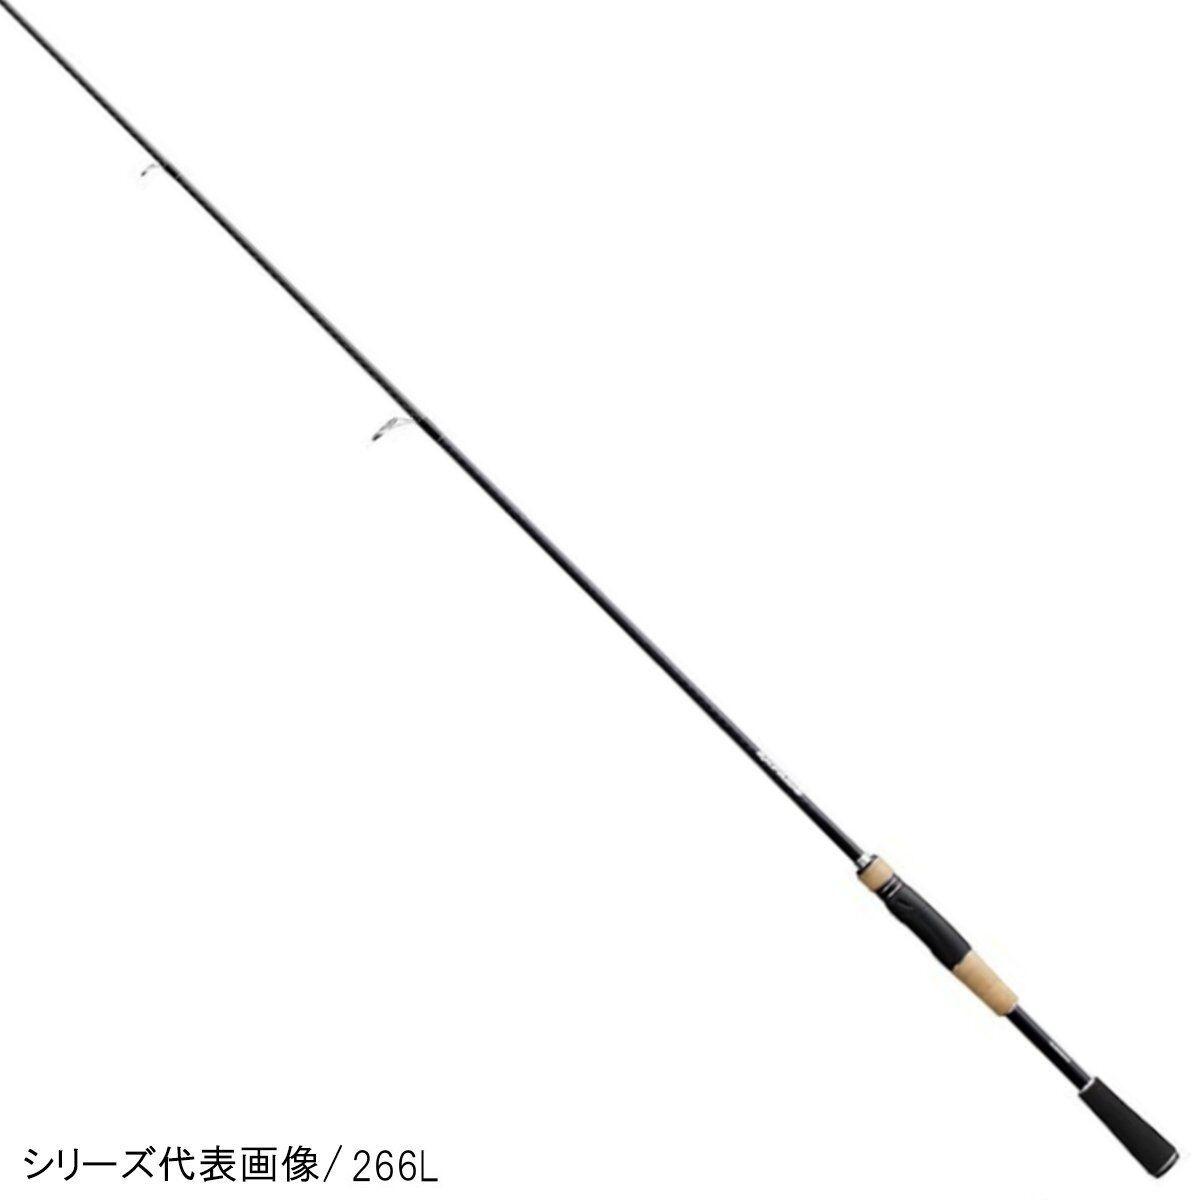 Nuovo Shimano Expride Solido Spin 263L-S 2 190cm Spigola Canna da Pesca Gratis